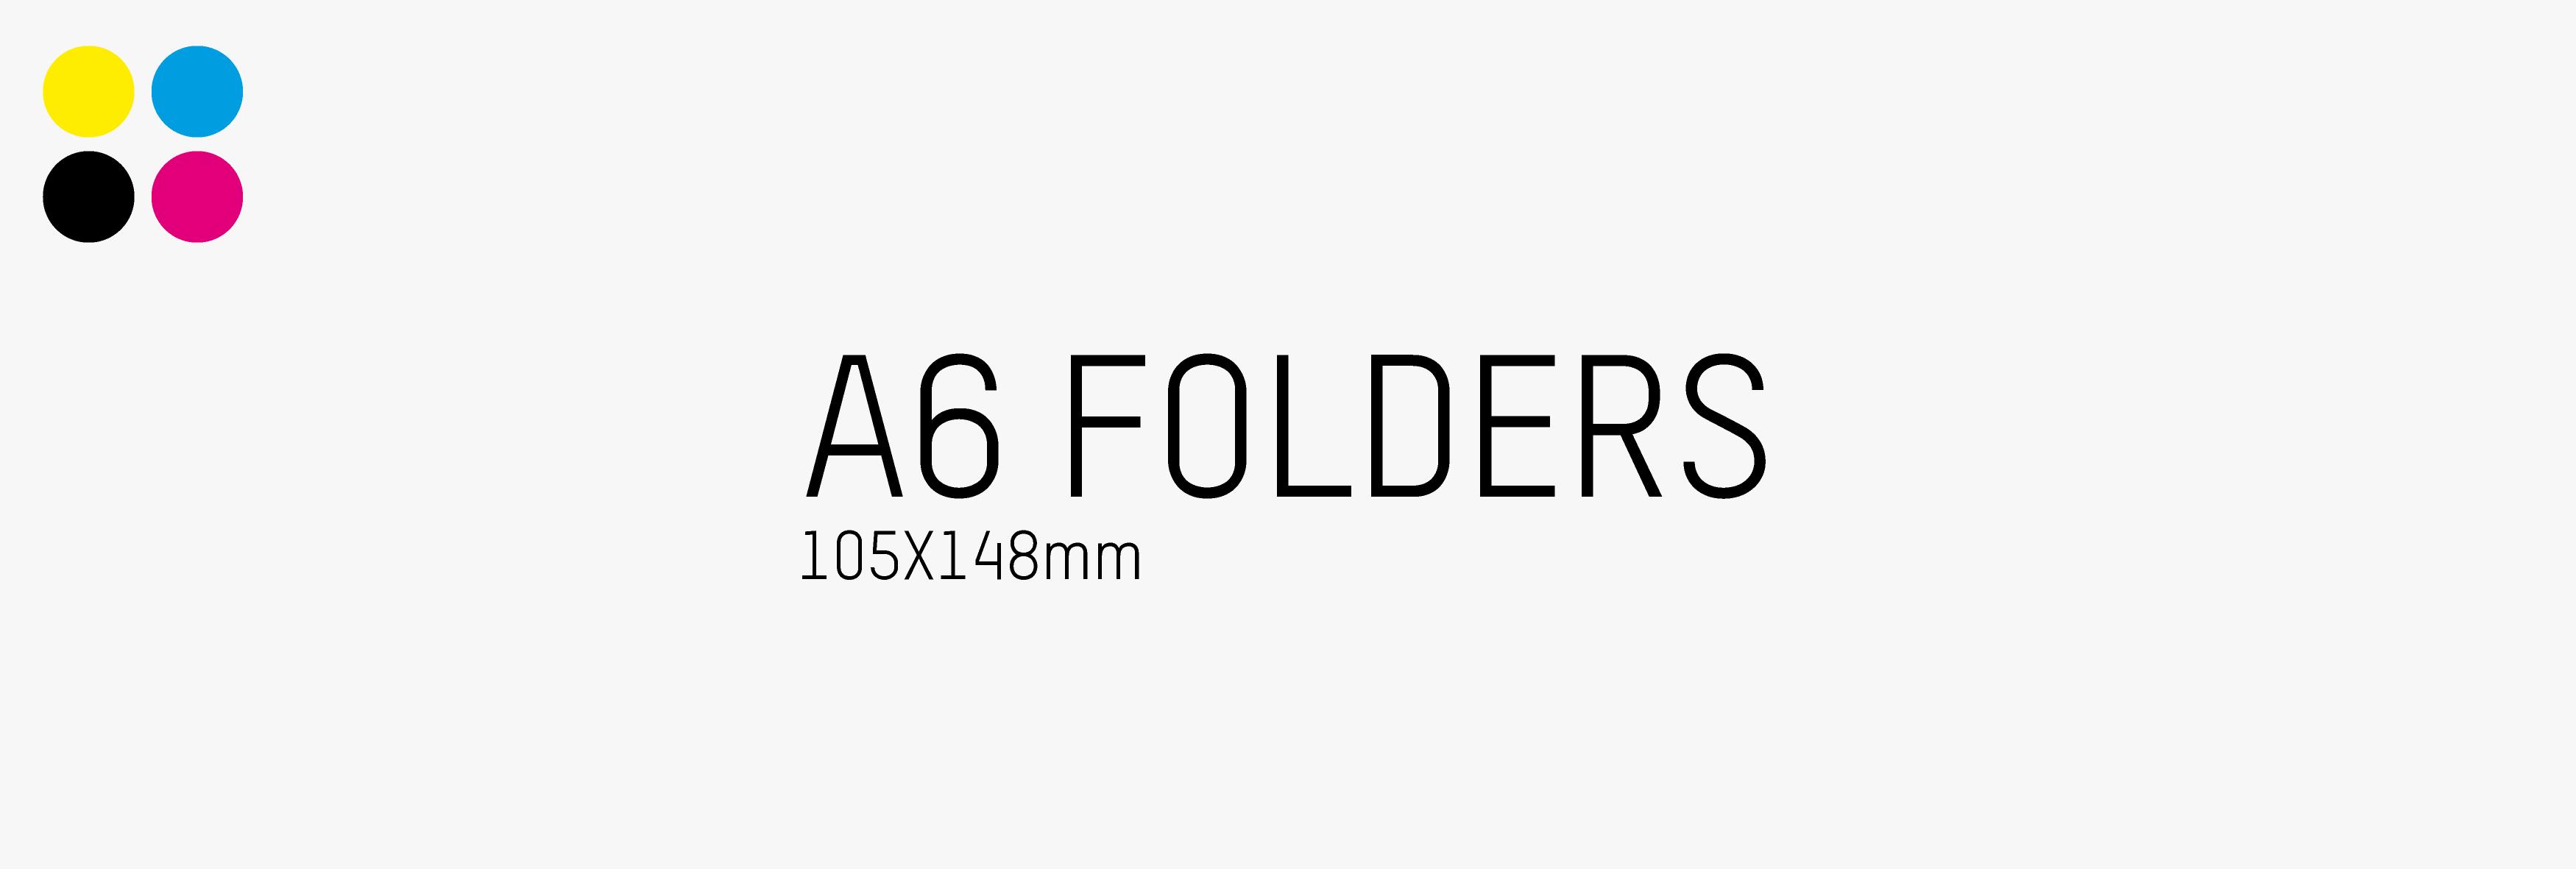 A6-folders